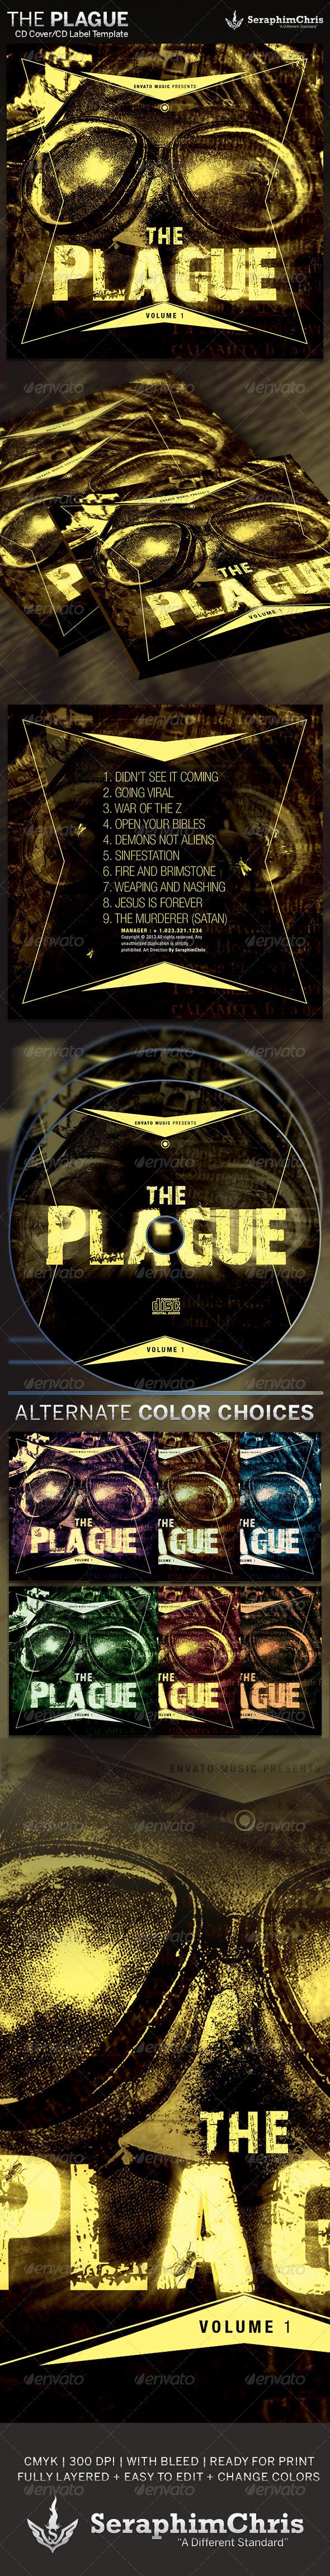 The Plague: CD Cover Artwork Template - CD & DVD Artwork Print Templates